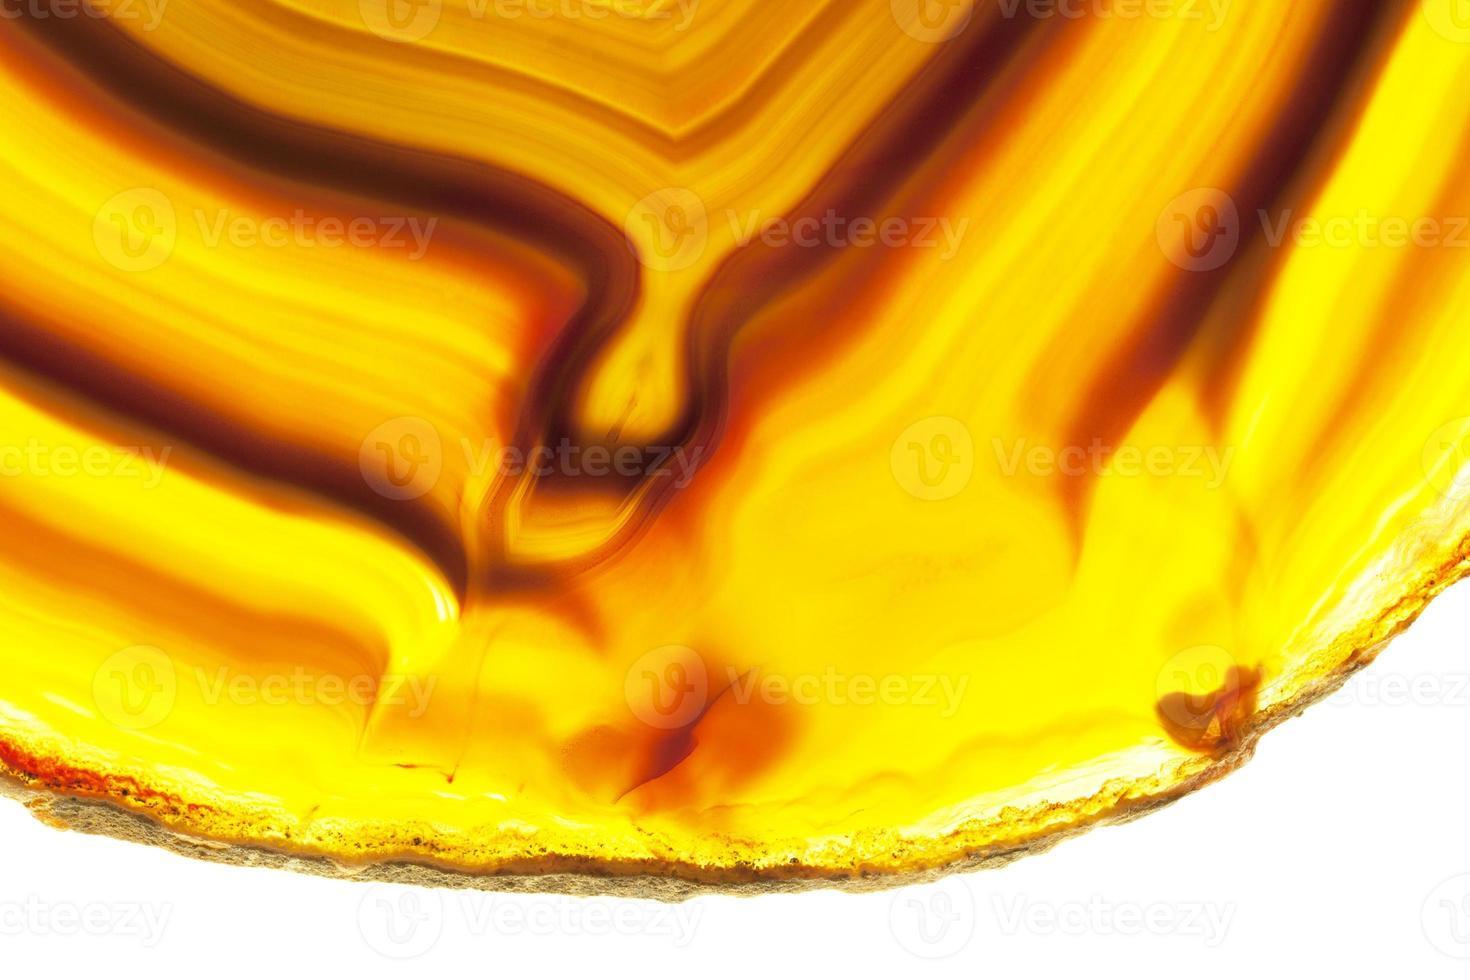 pedra preciosa ágata close-up foto